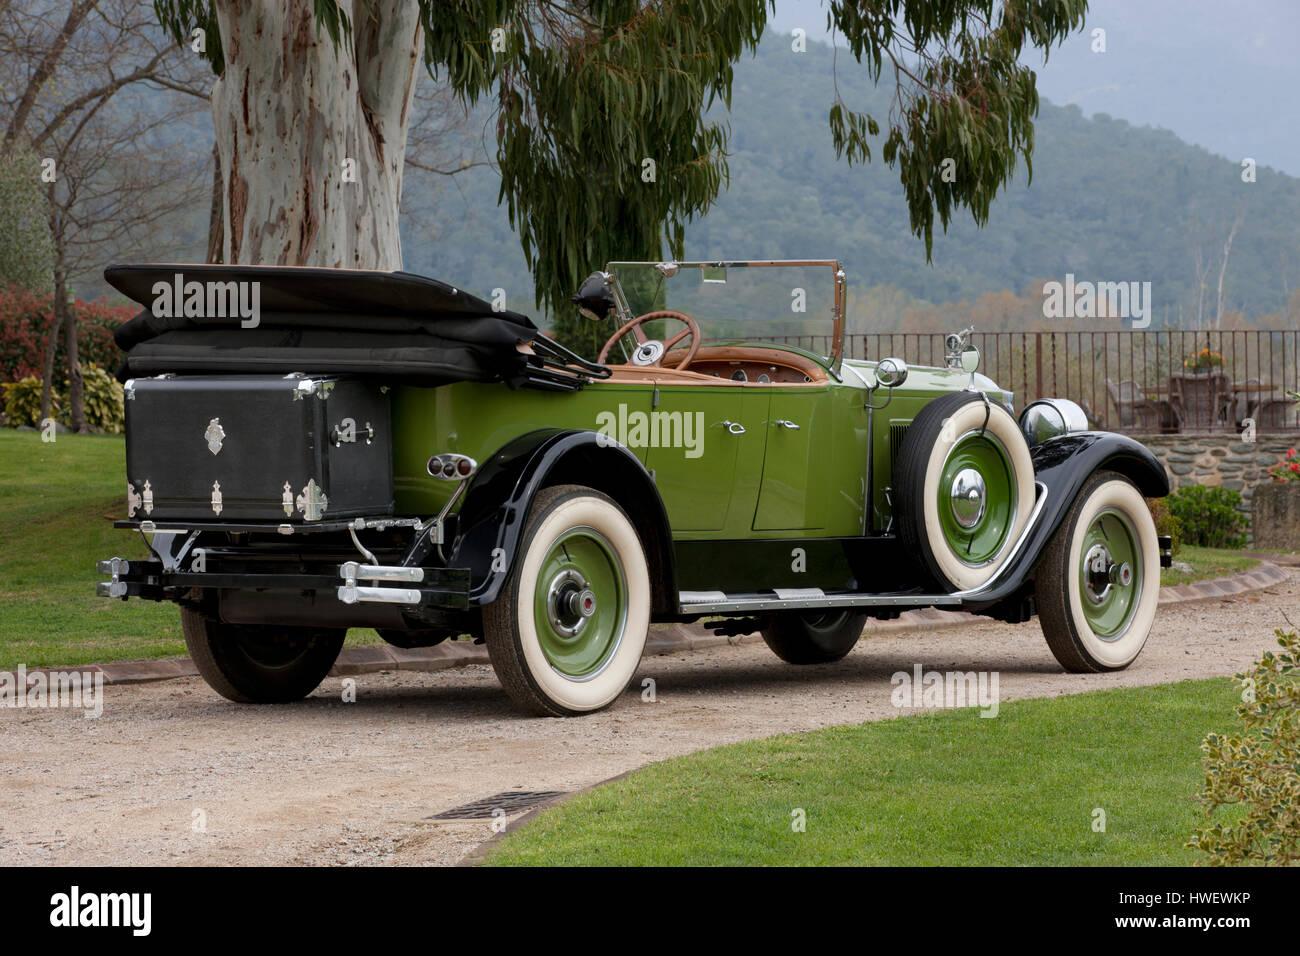 1926 Packard Eight 243 7-Passenger Touring - Stock Image